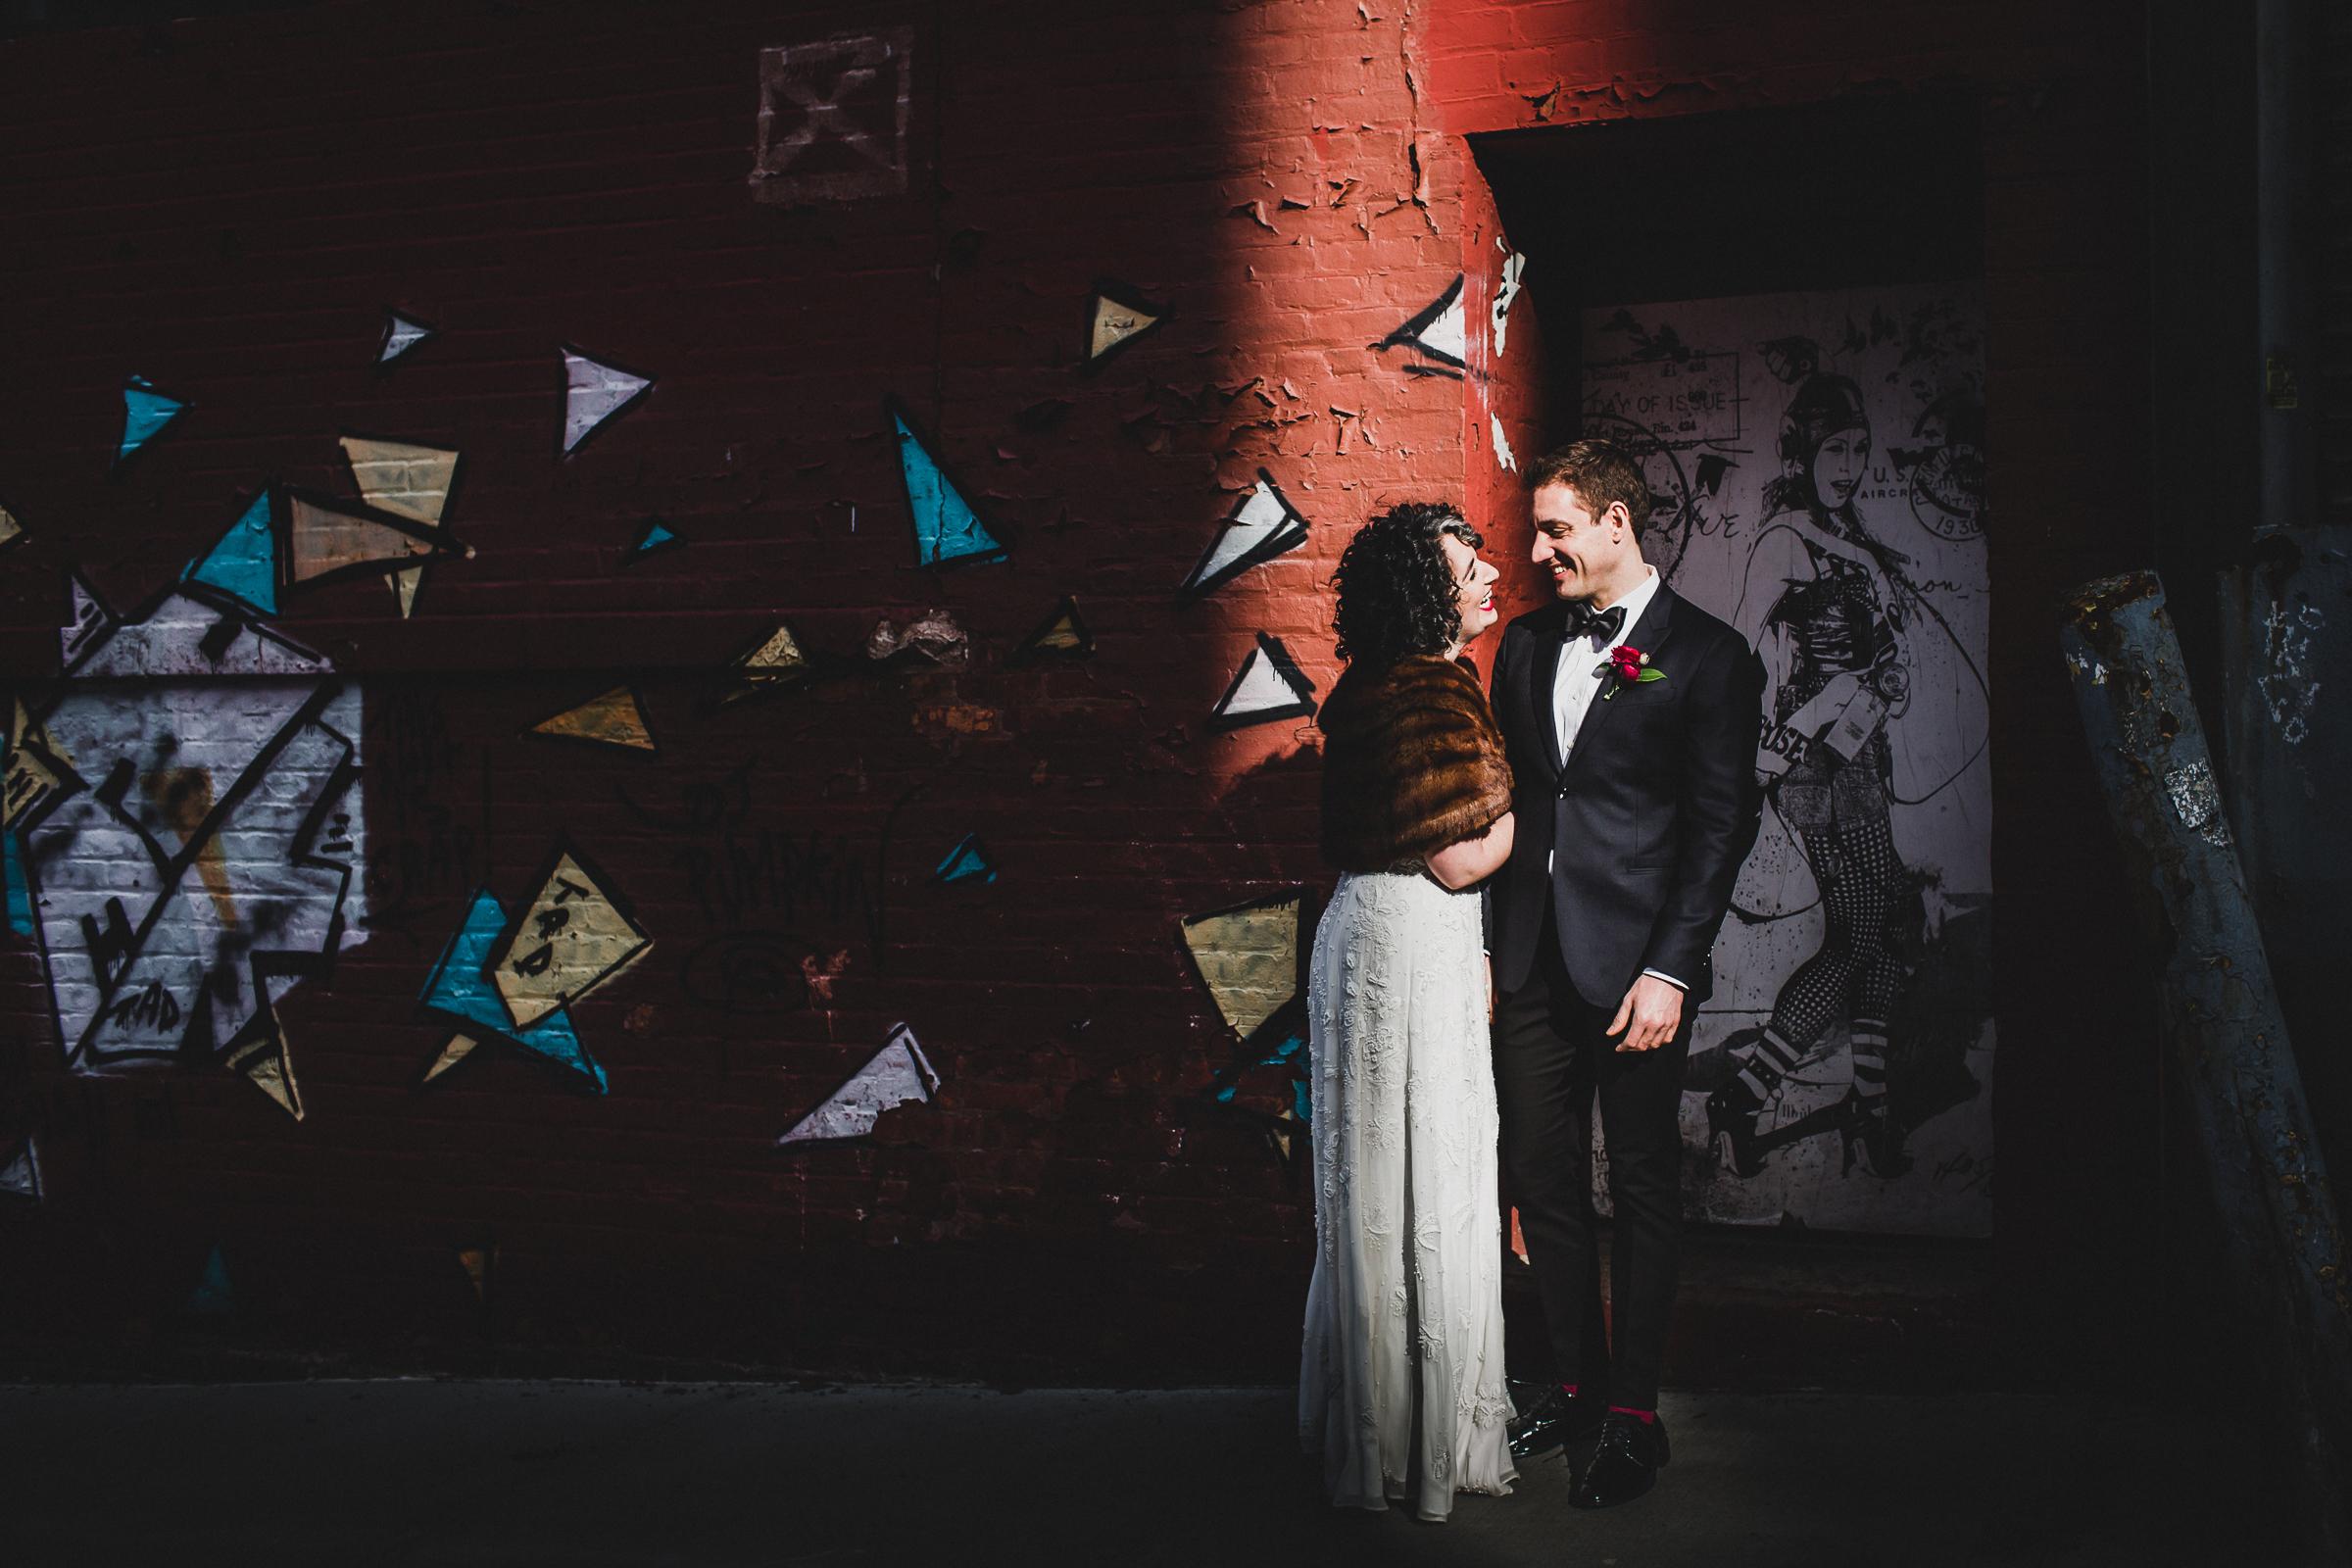 New-York-Documentary-Wedding-Photography-Best-Of-2017-by-Elvira-Kalviste-Photography-62.jpg